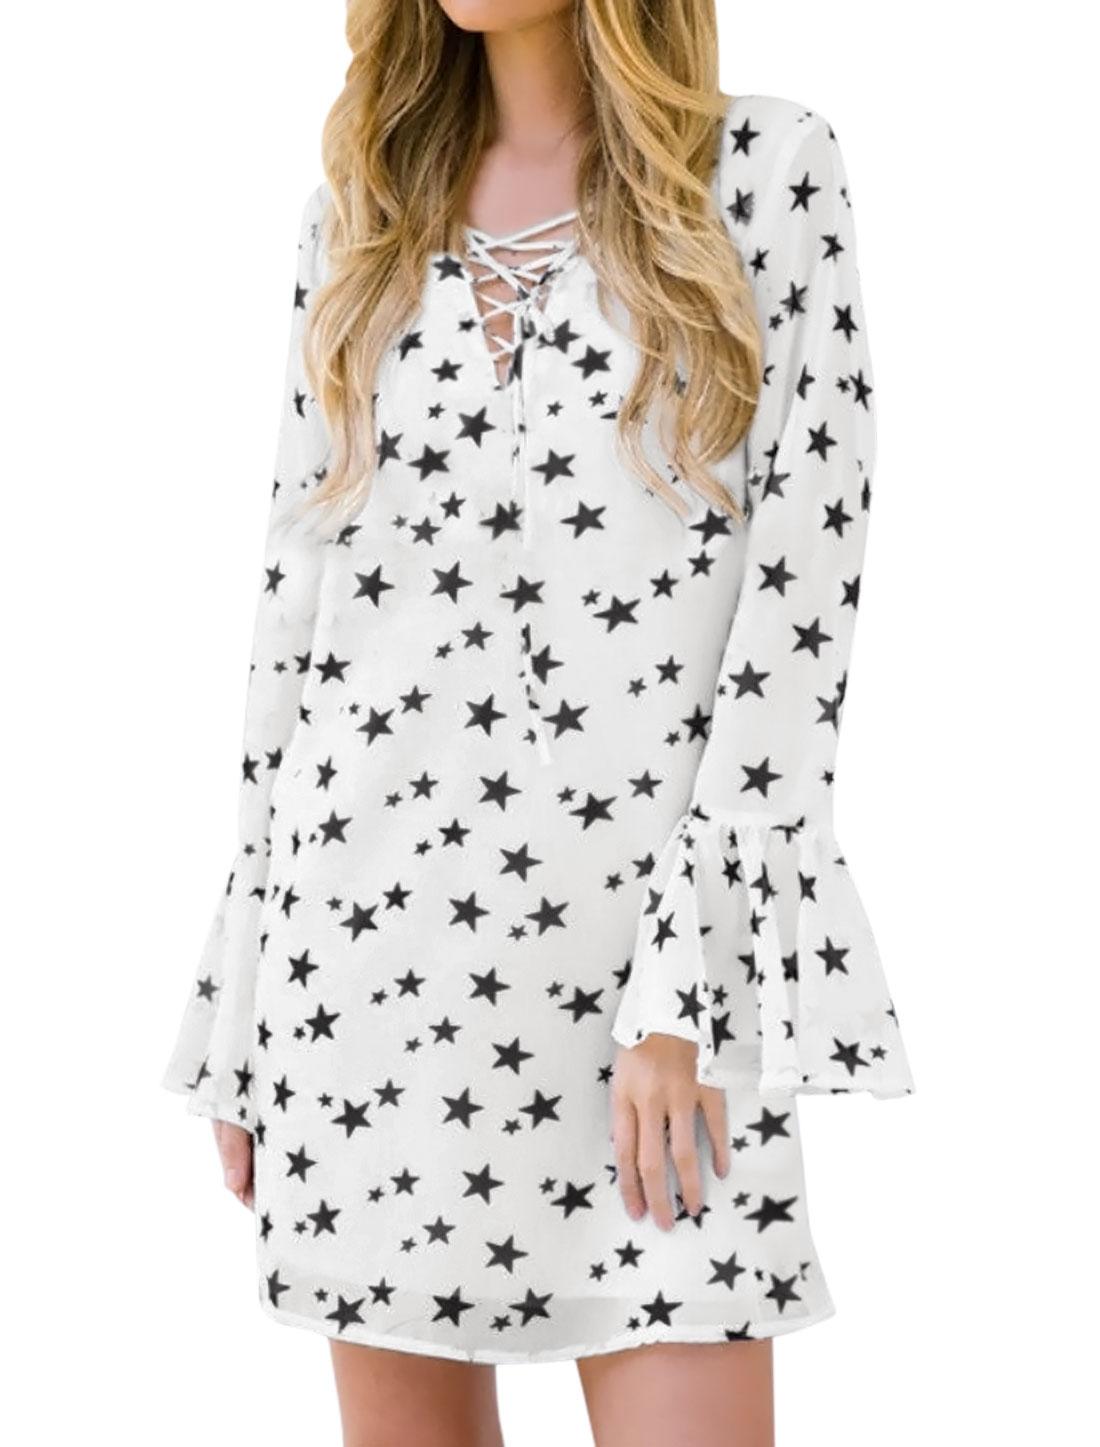 Women Lace Up Long Sleeves Stars Pattern Bell Cuffs Tunic Dress White S